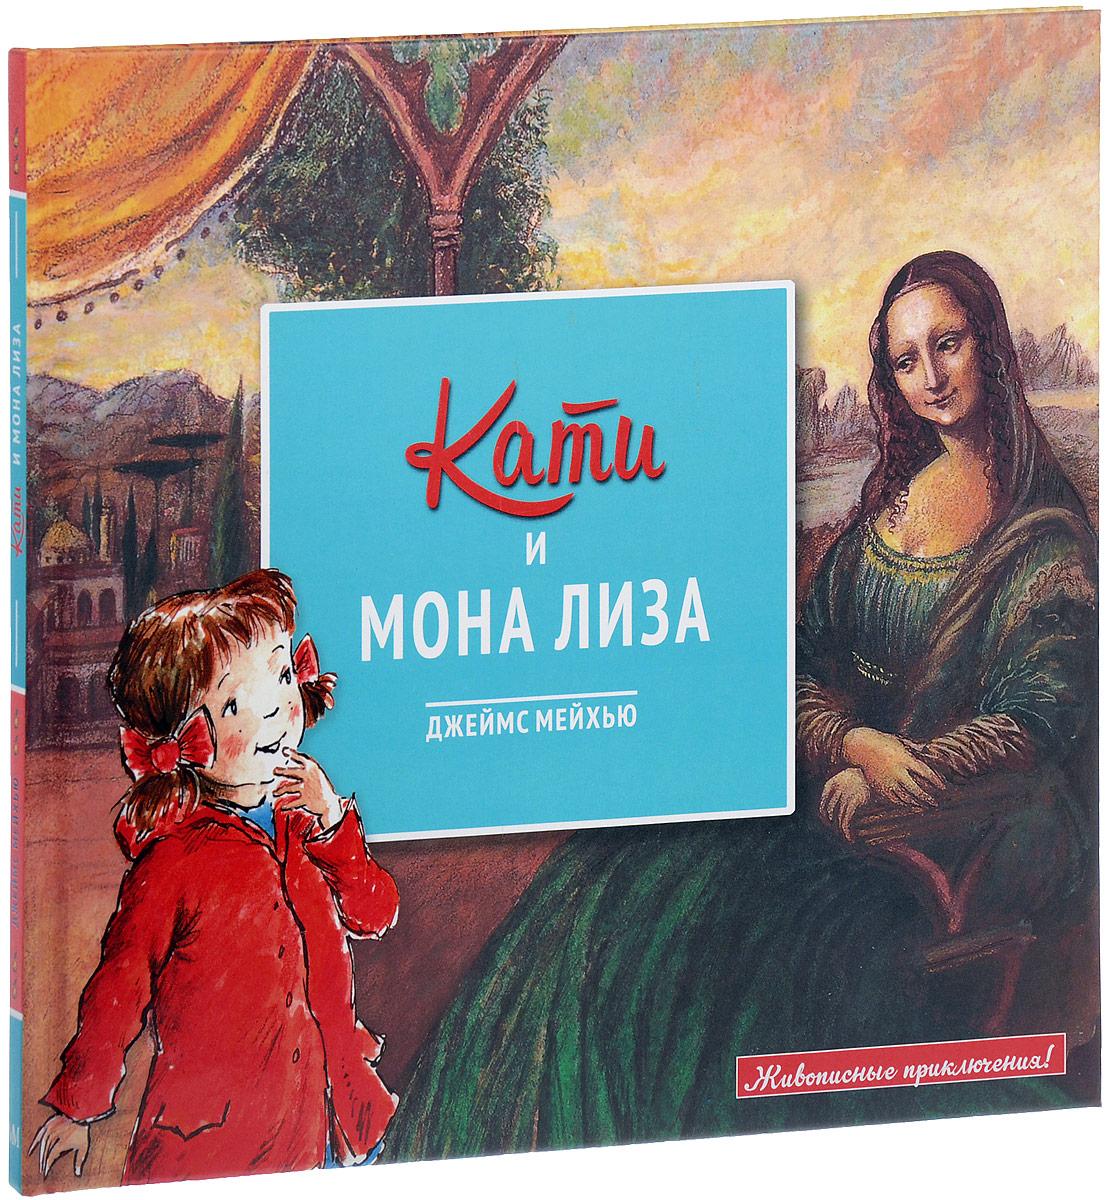 Джеймс Мейхью Кати и Мона Лиза серия джеймс эшер где